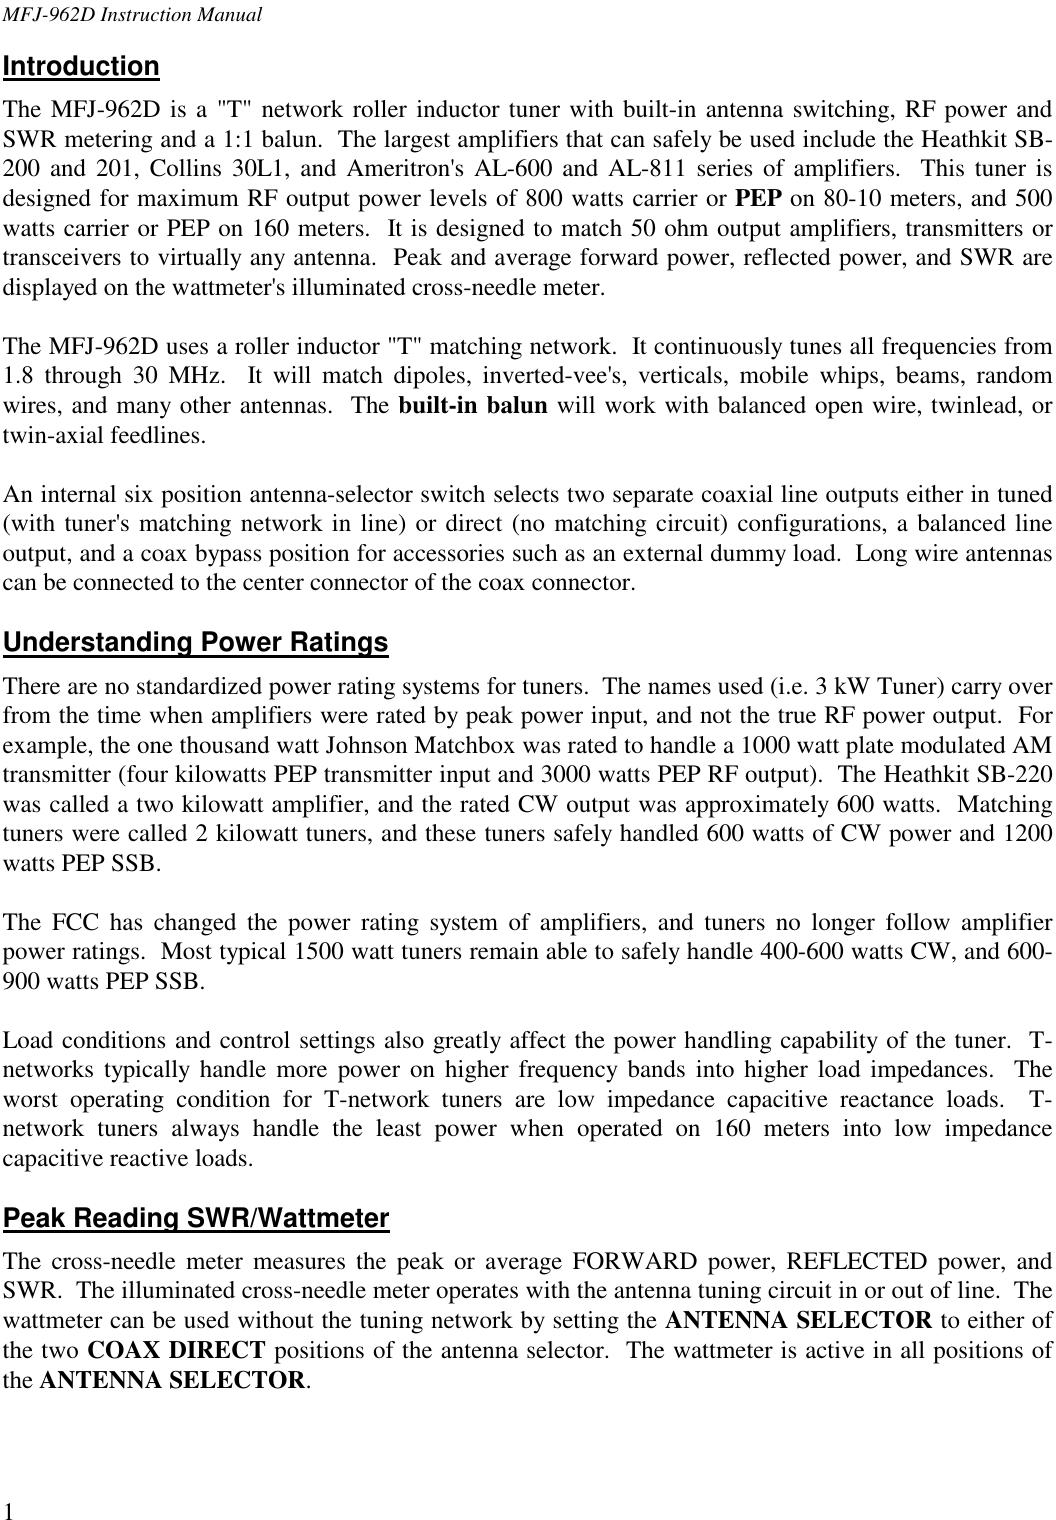 MFJ 962D Instruction Manual